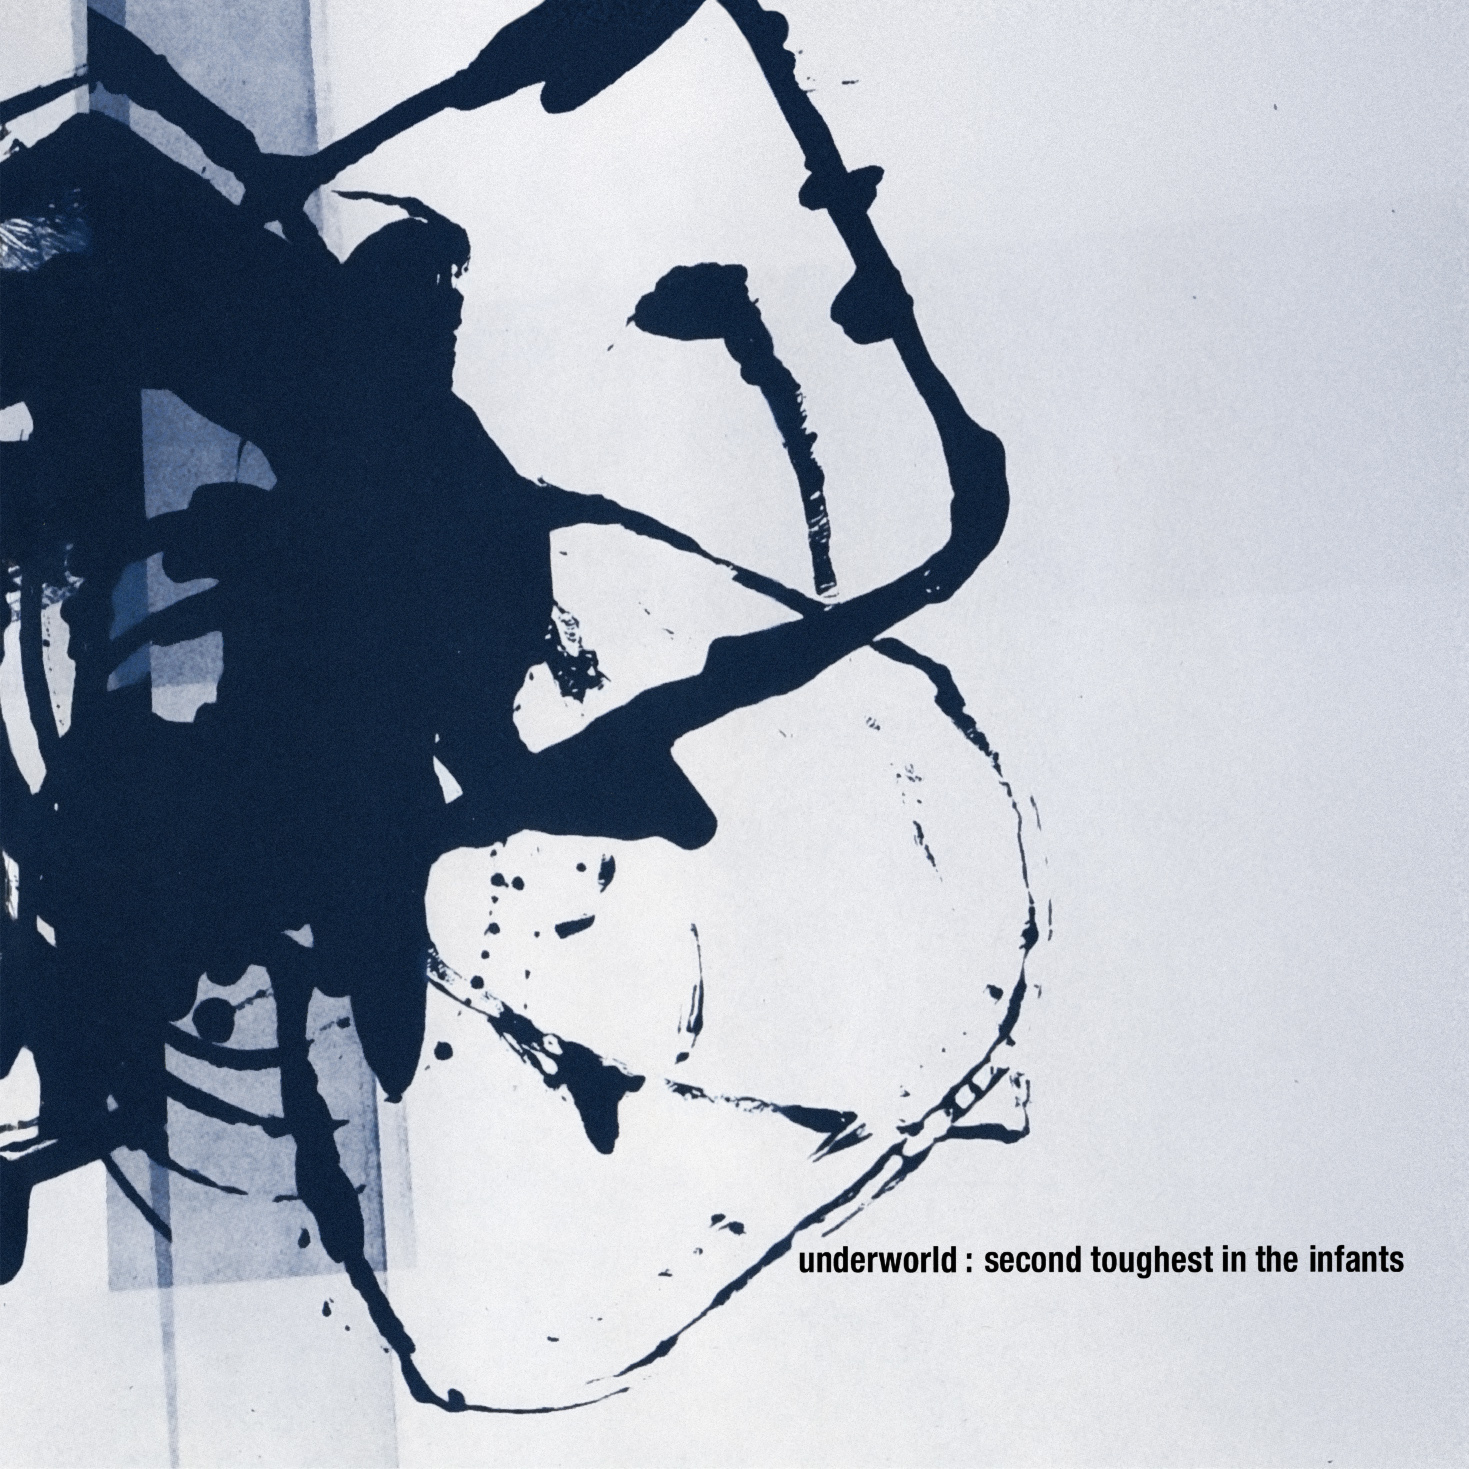 Album Artist: Underworld / Album Title: Second Toughest in the Infants